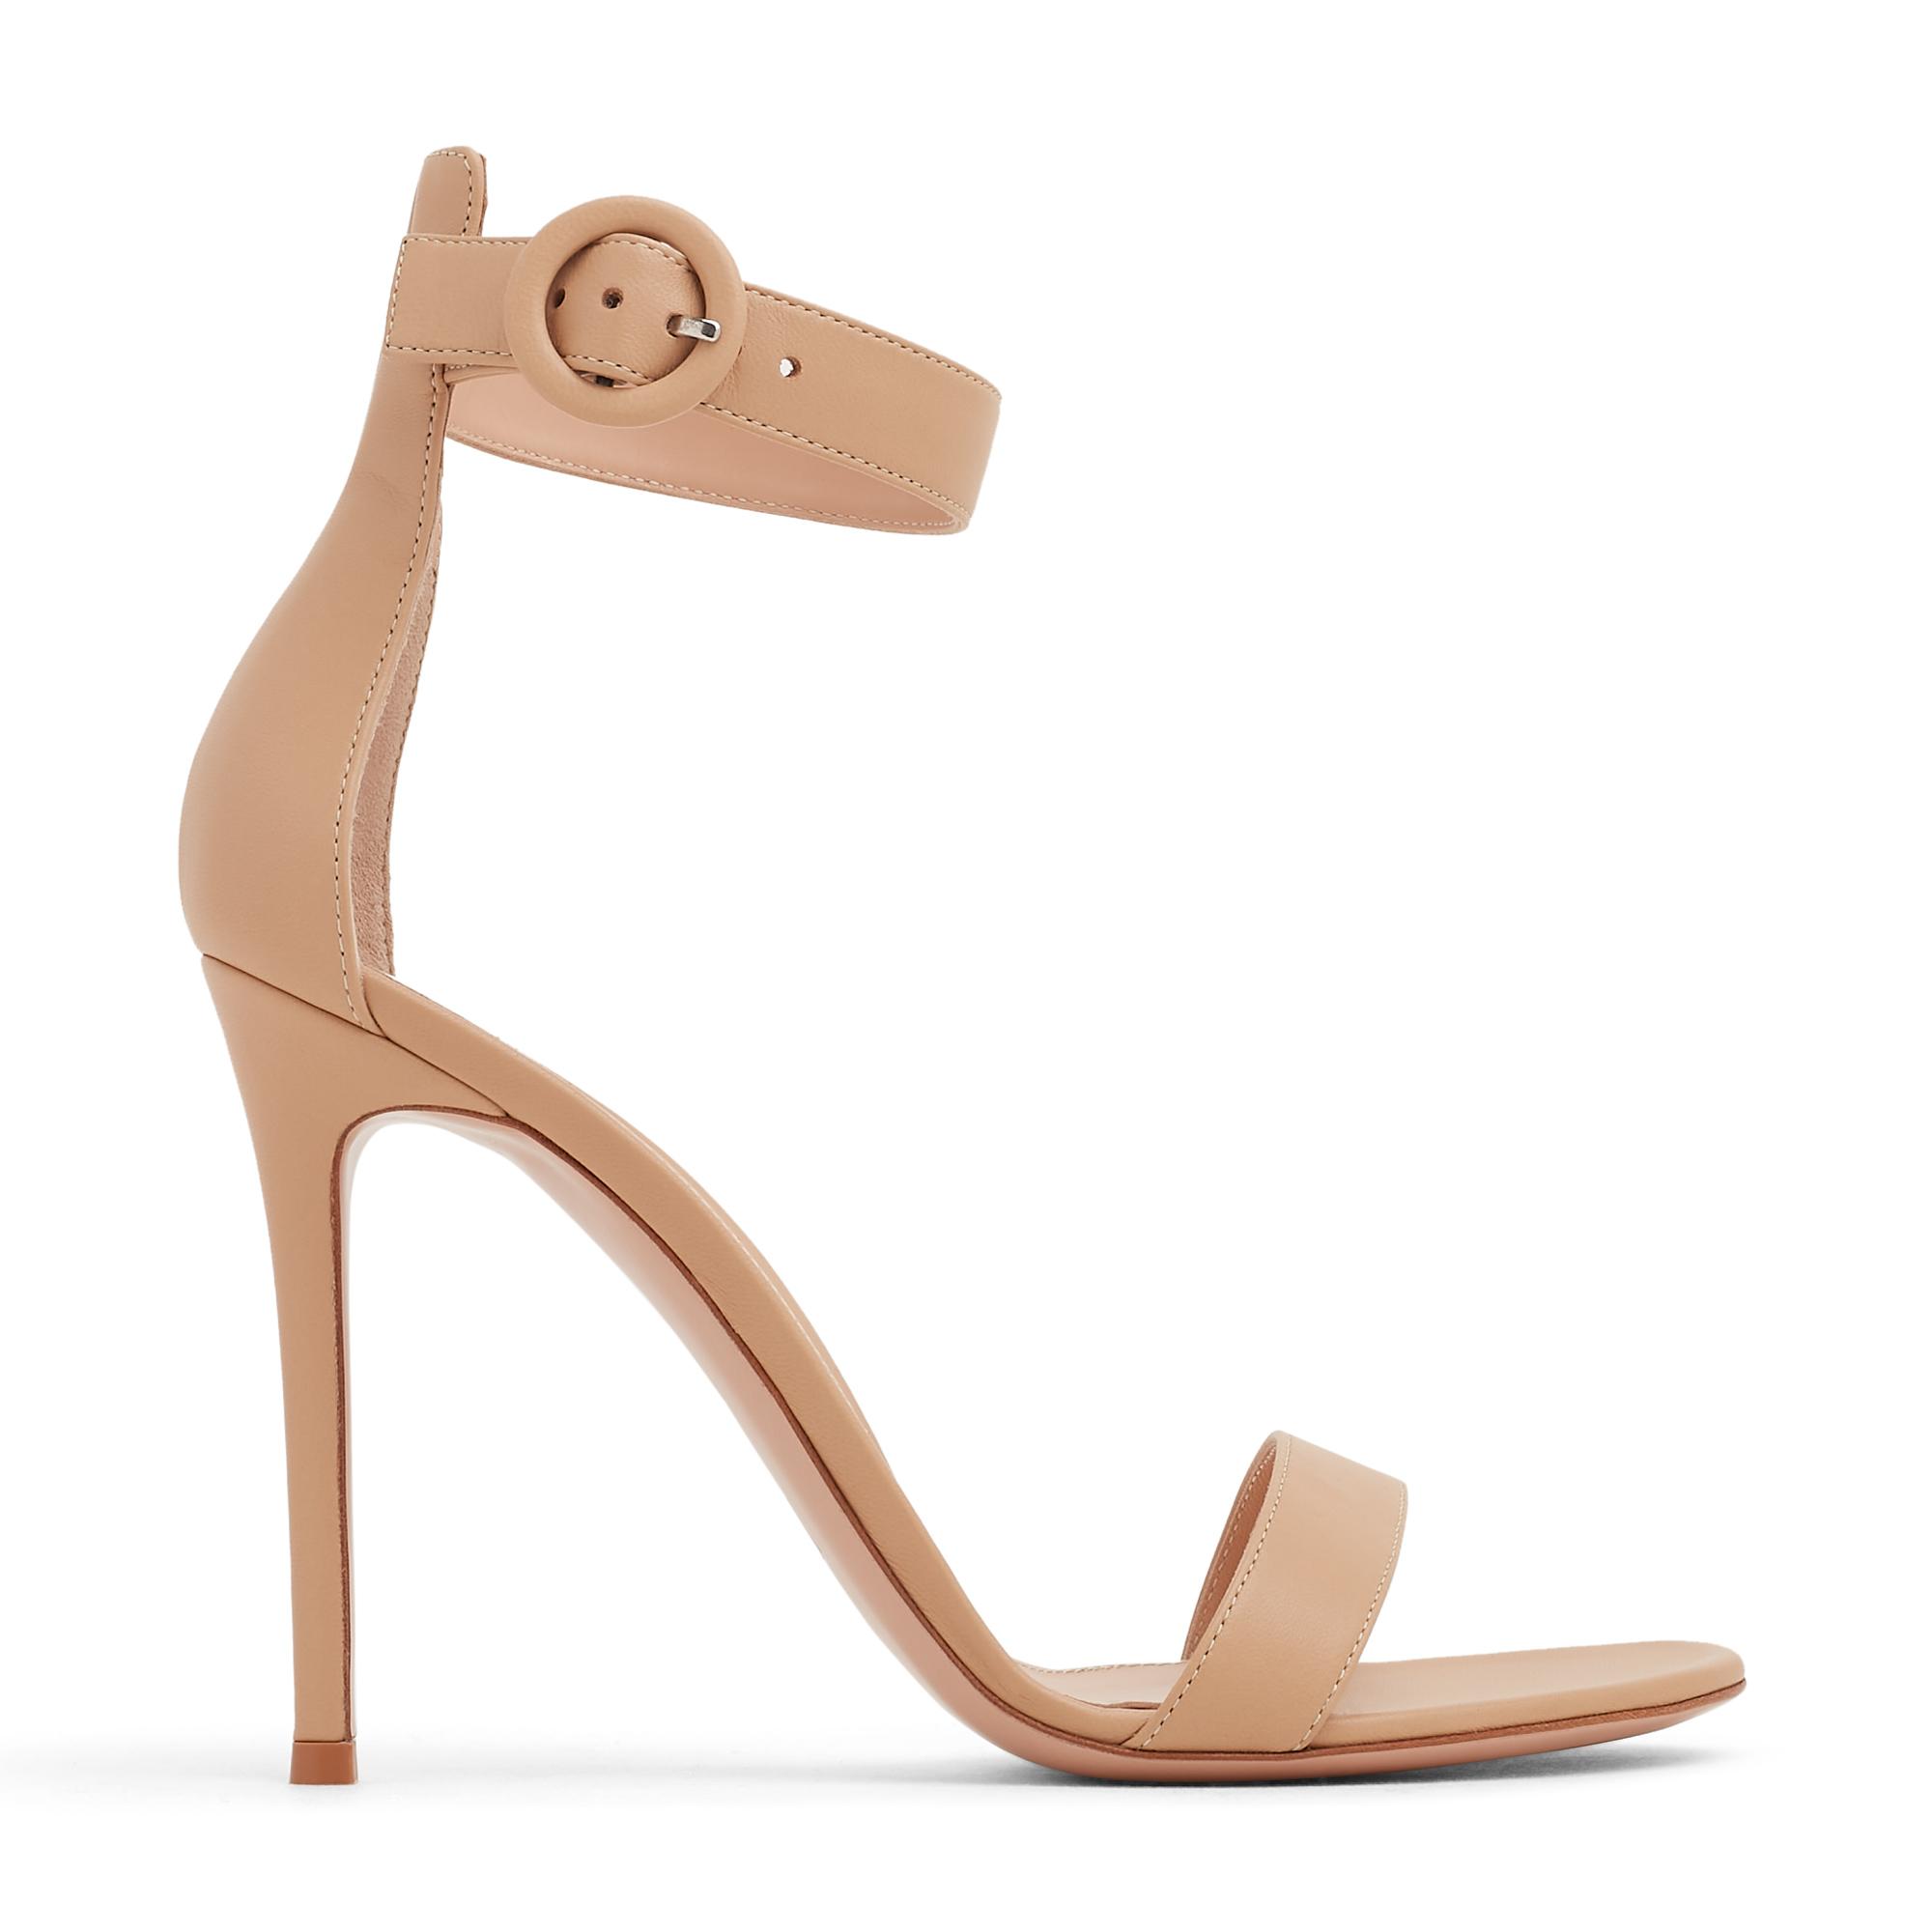 Portofino leather sandals